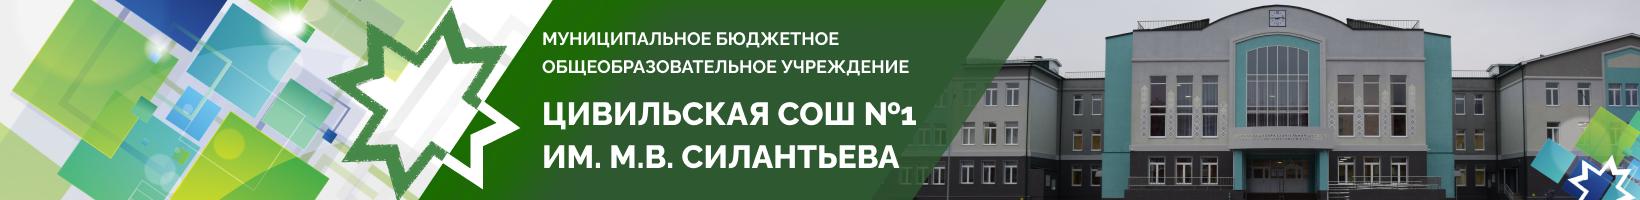 Сайт МБОУ